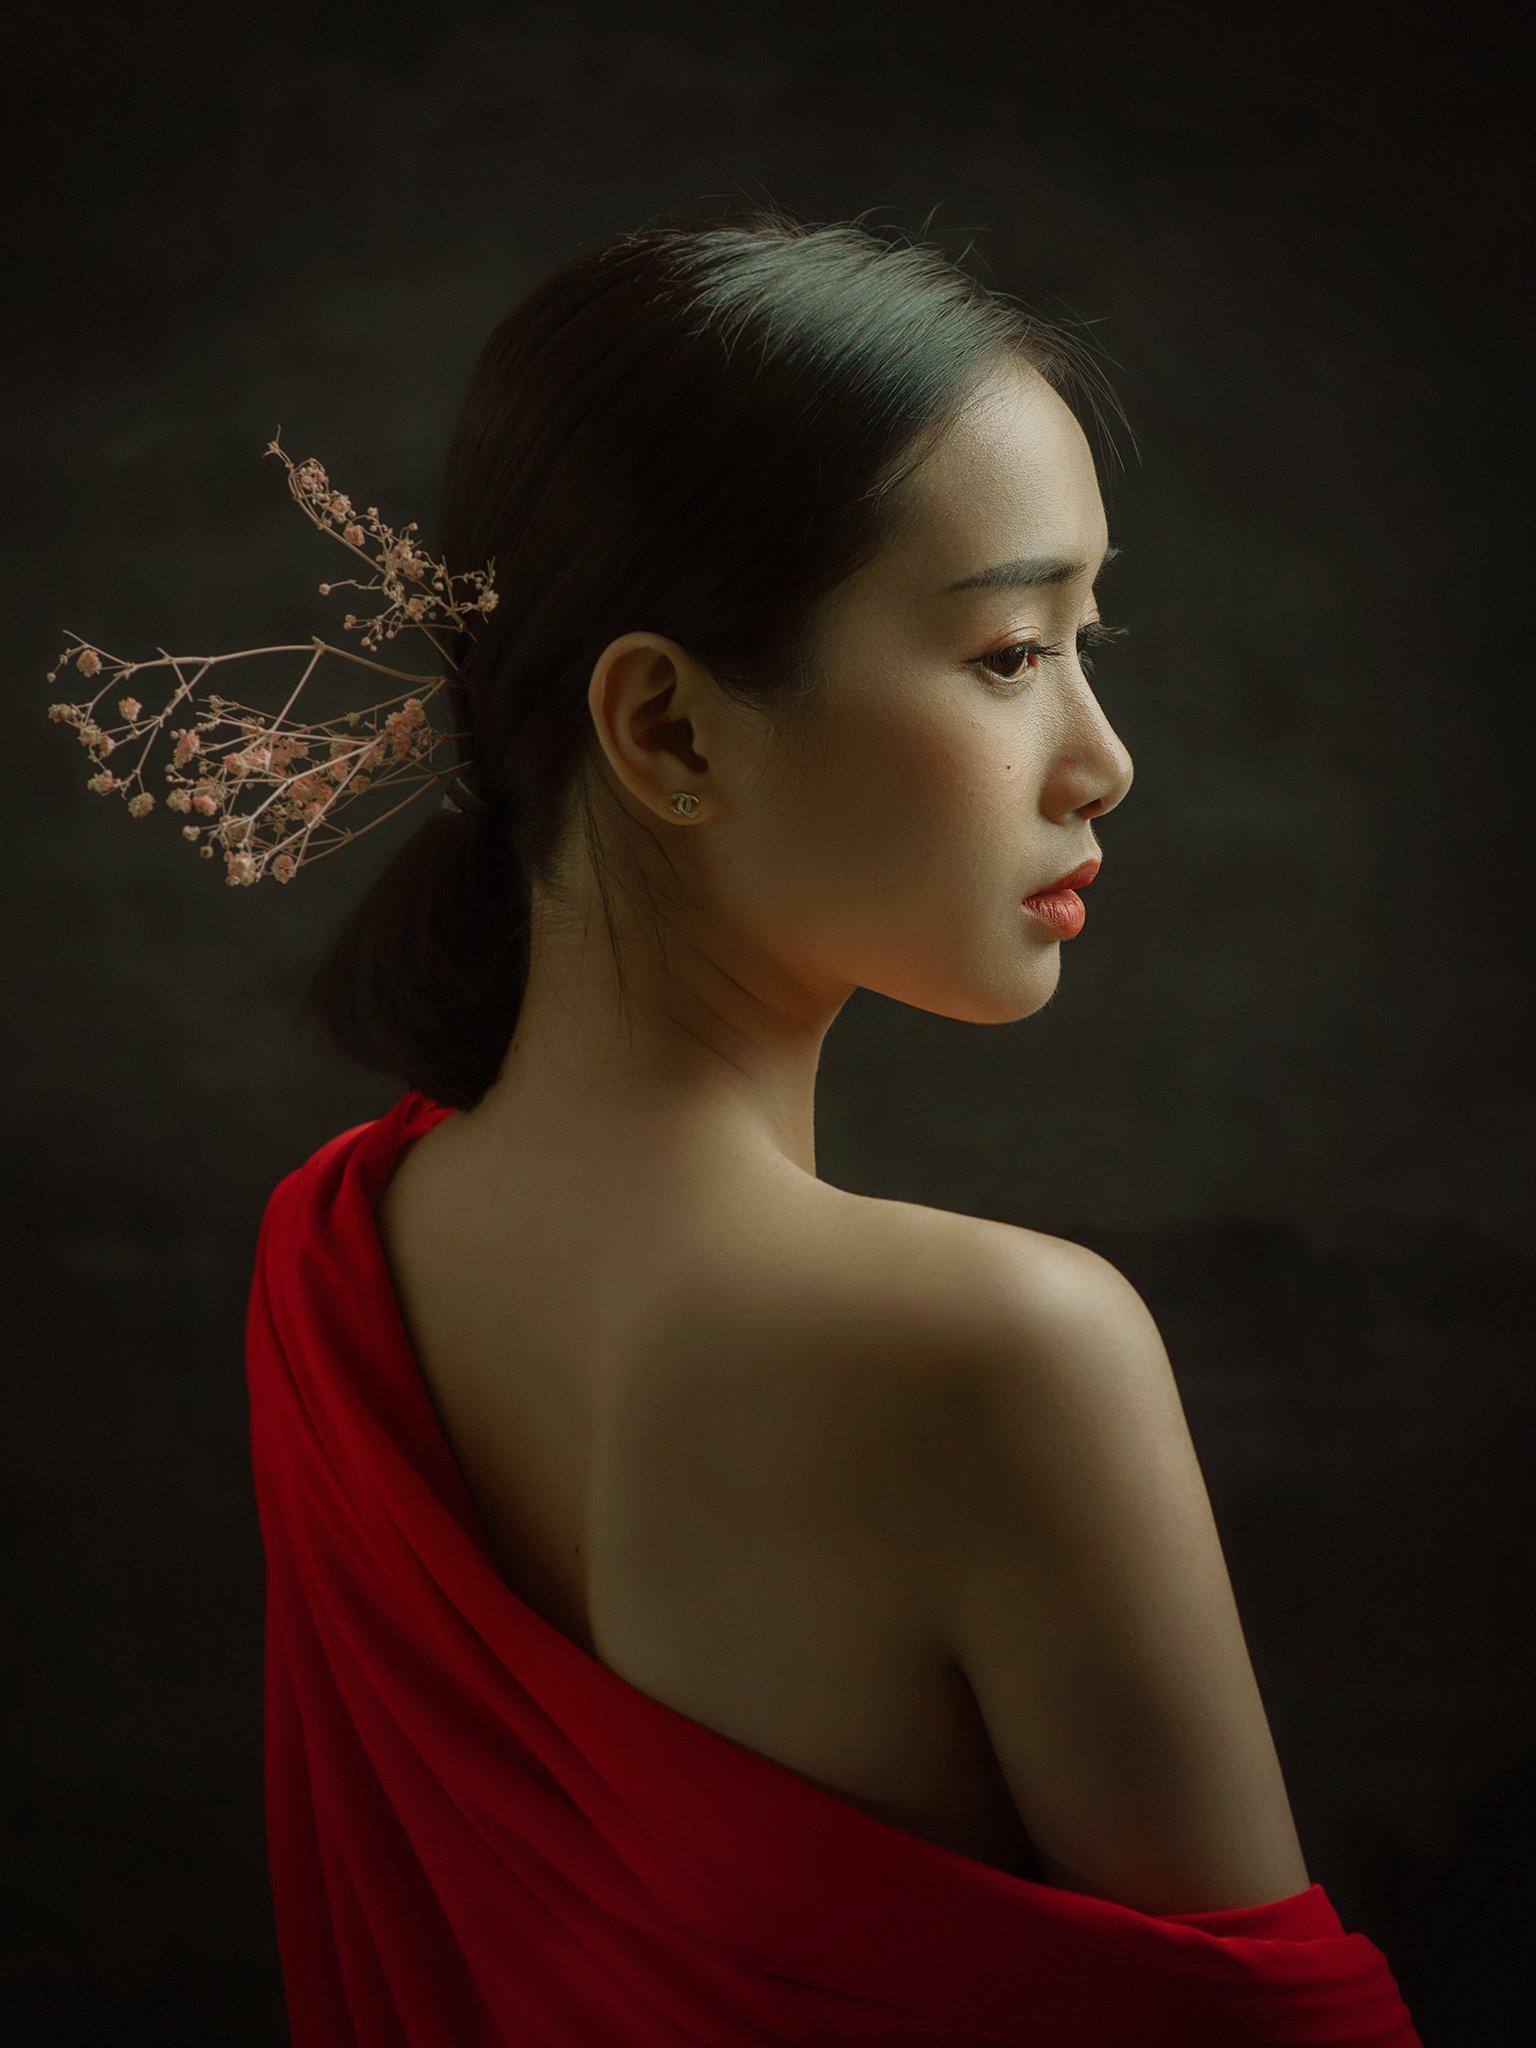 portrait, female, woman, girl, asian, vietnam, vietnamese, young, studio, mood, skin, flesh, Hoang Viet Nguyen